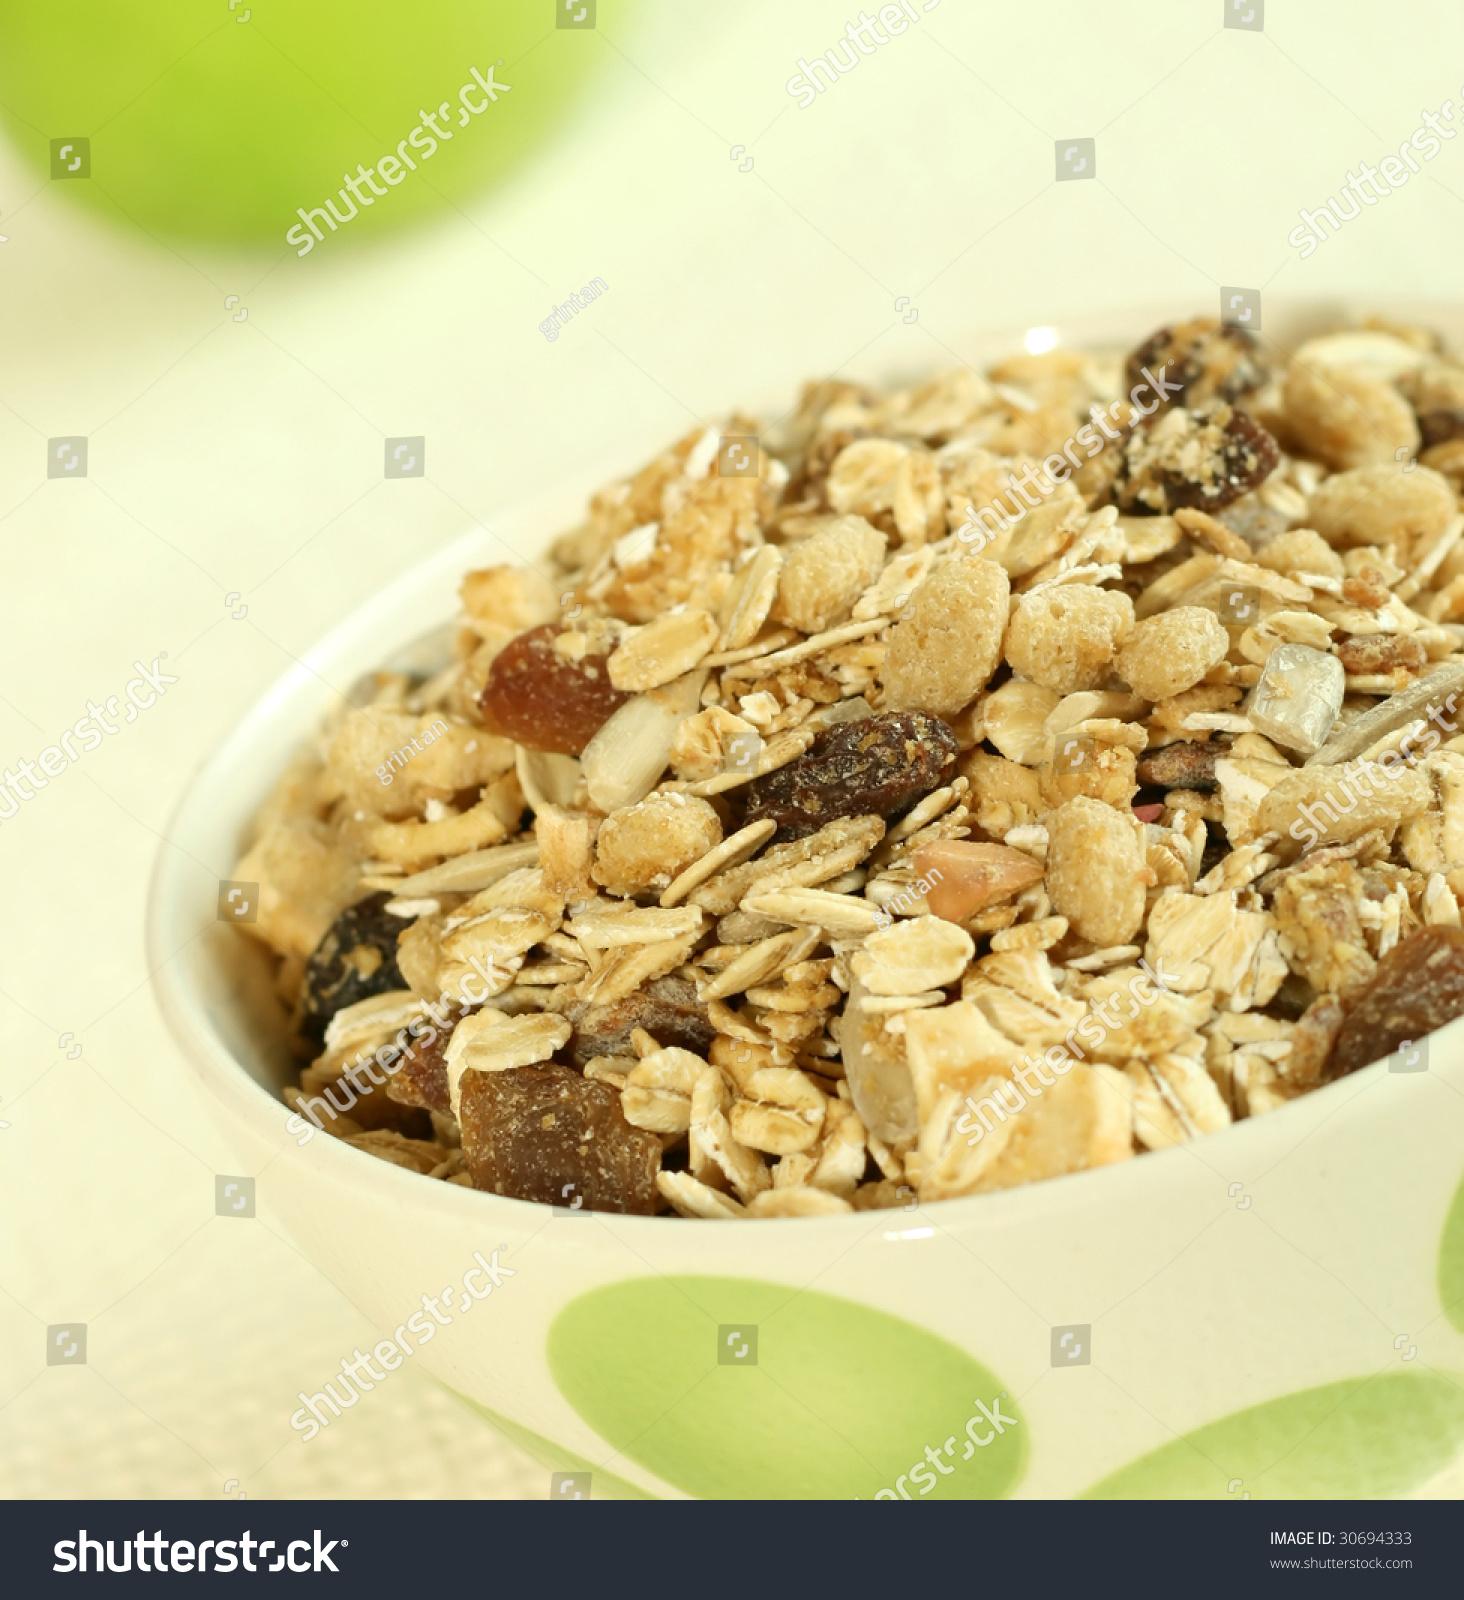 how to serve muesli for breakfast